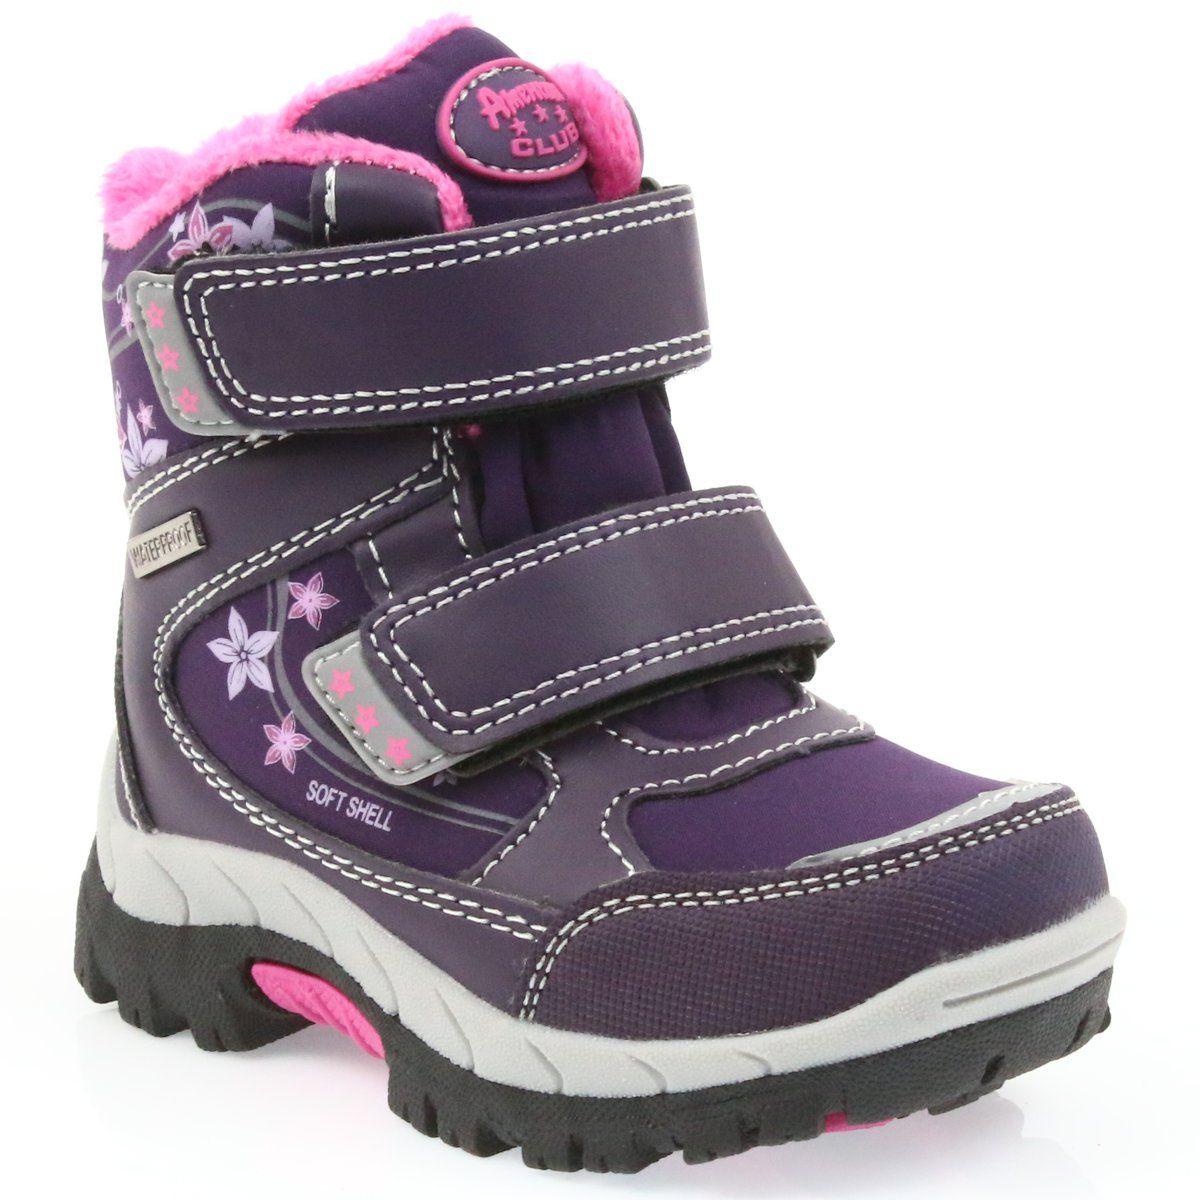 American Club American Kozaki Buty Zimowe Z Membrana 3121 Fioletowe Boots Shoes Winter Boot